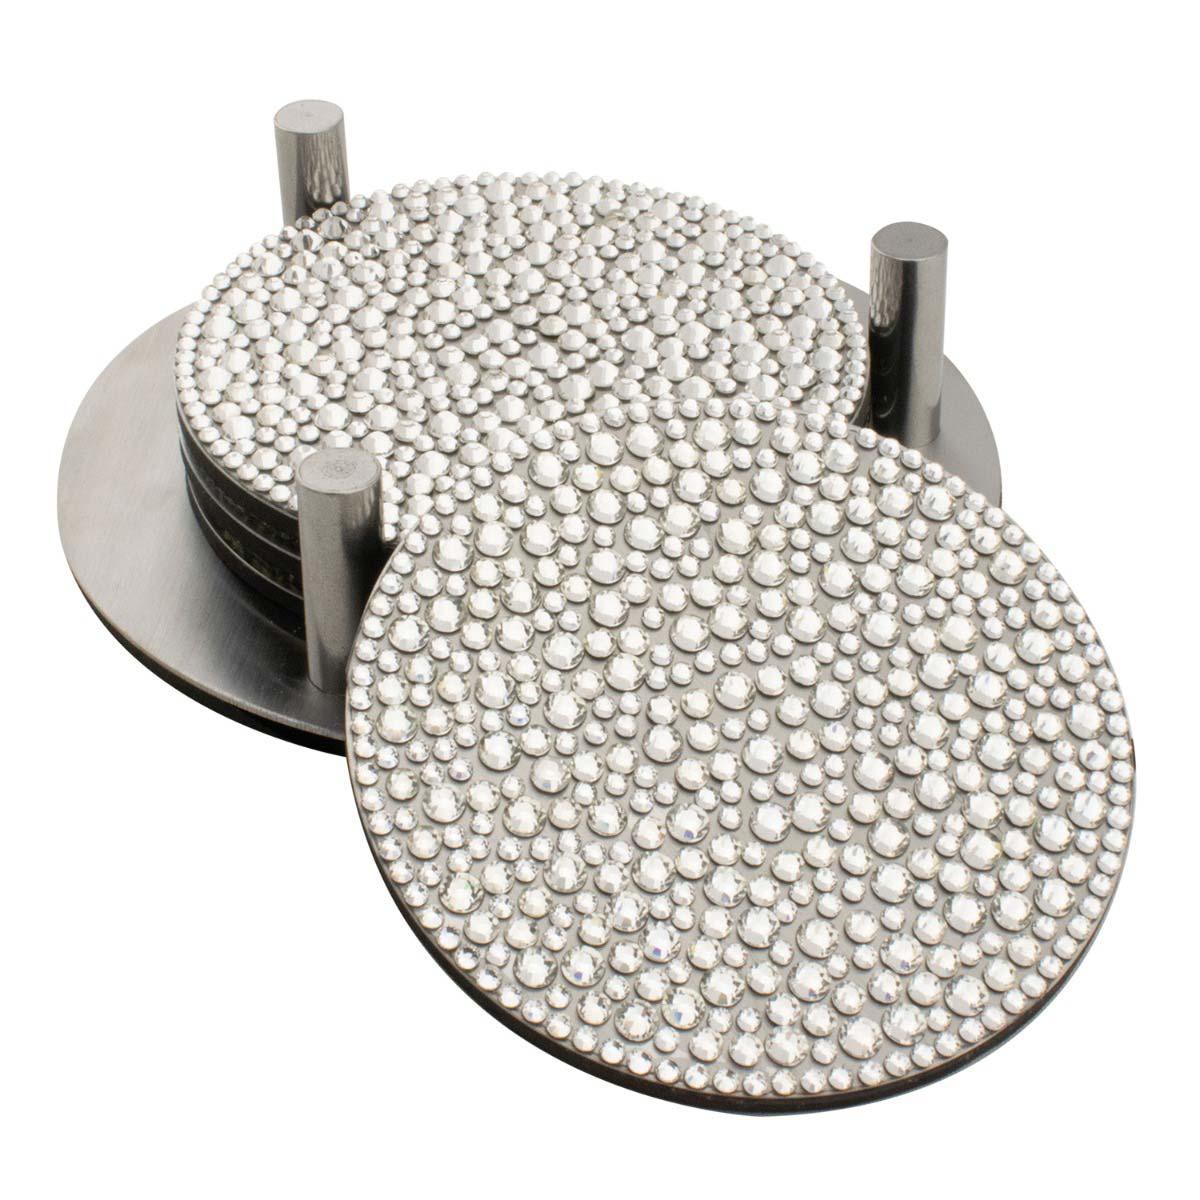 Sparkles Home Strass Coaster Set (Set of 4 w/ Holder)